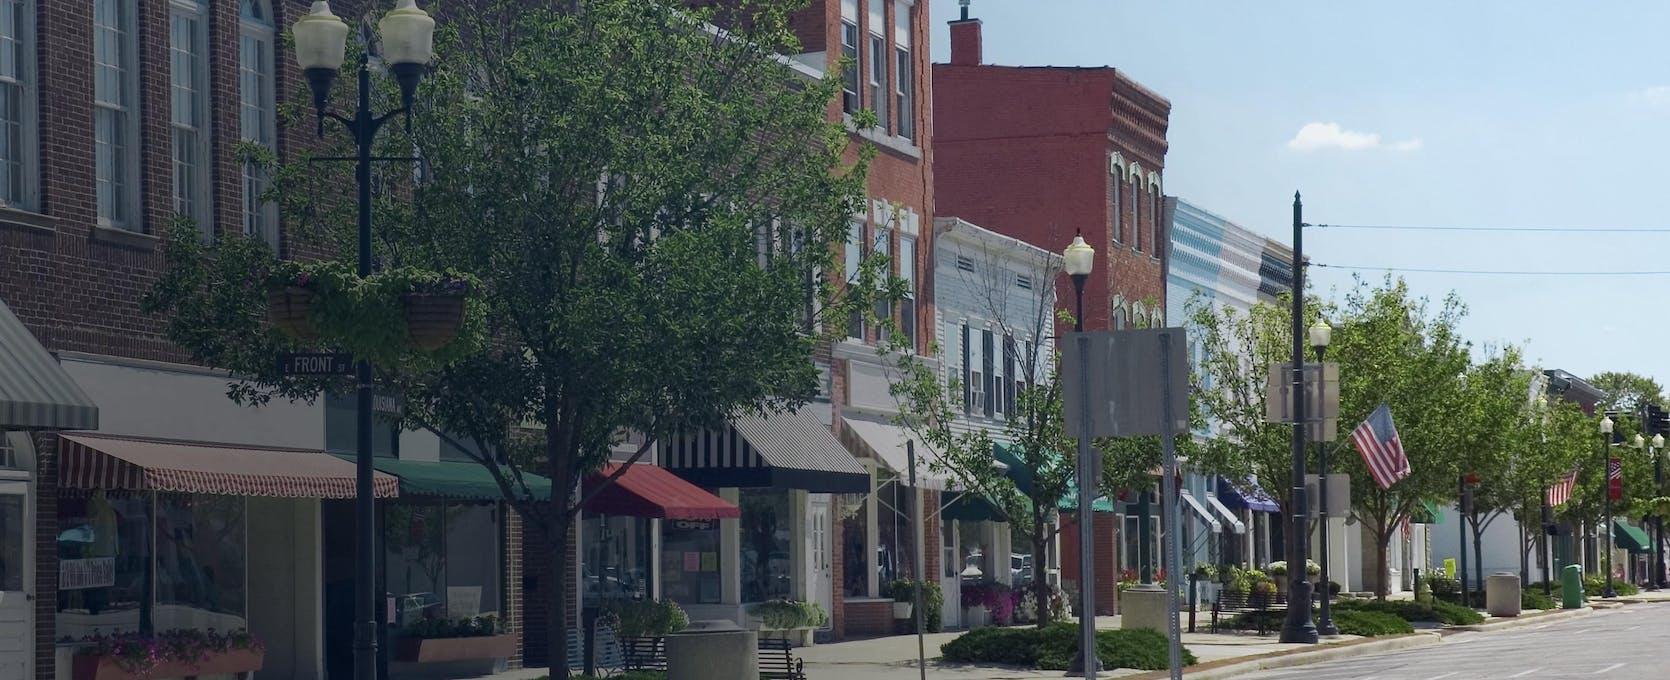 Tree-lined street represents Main Street America